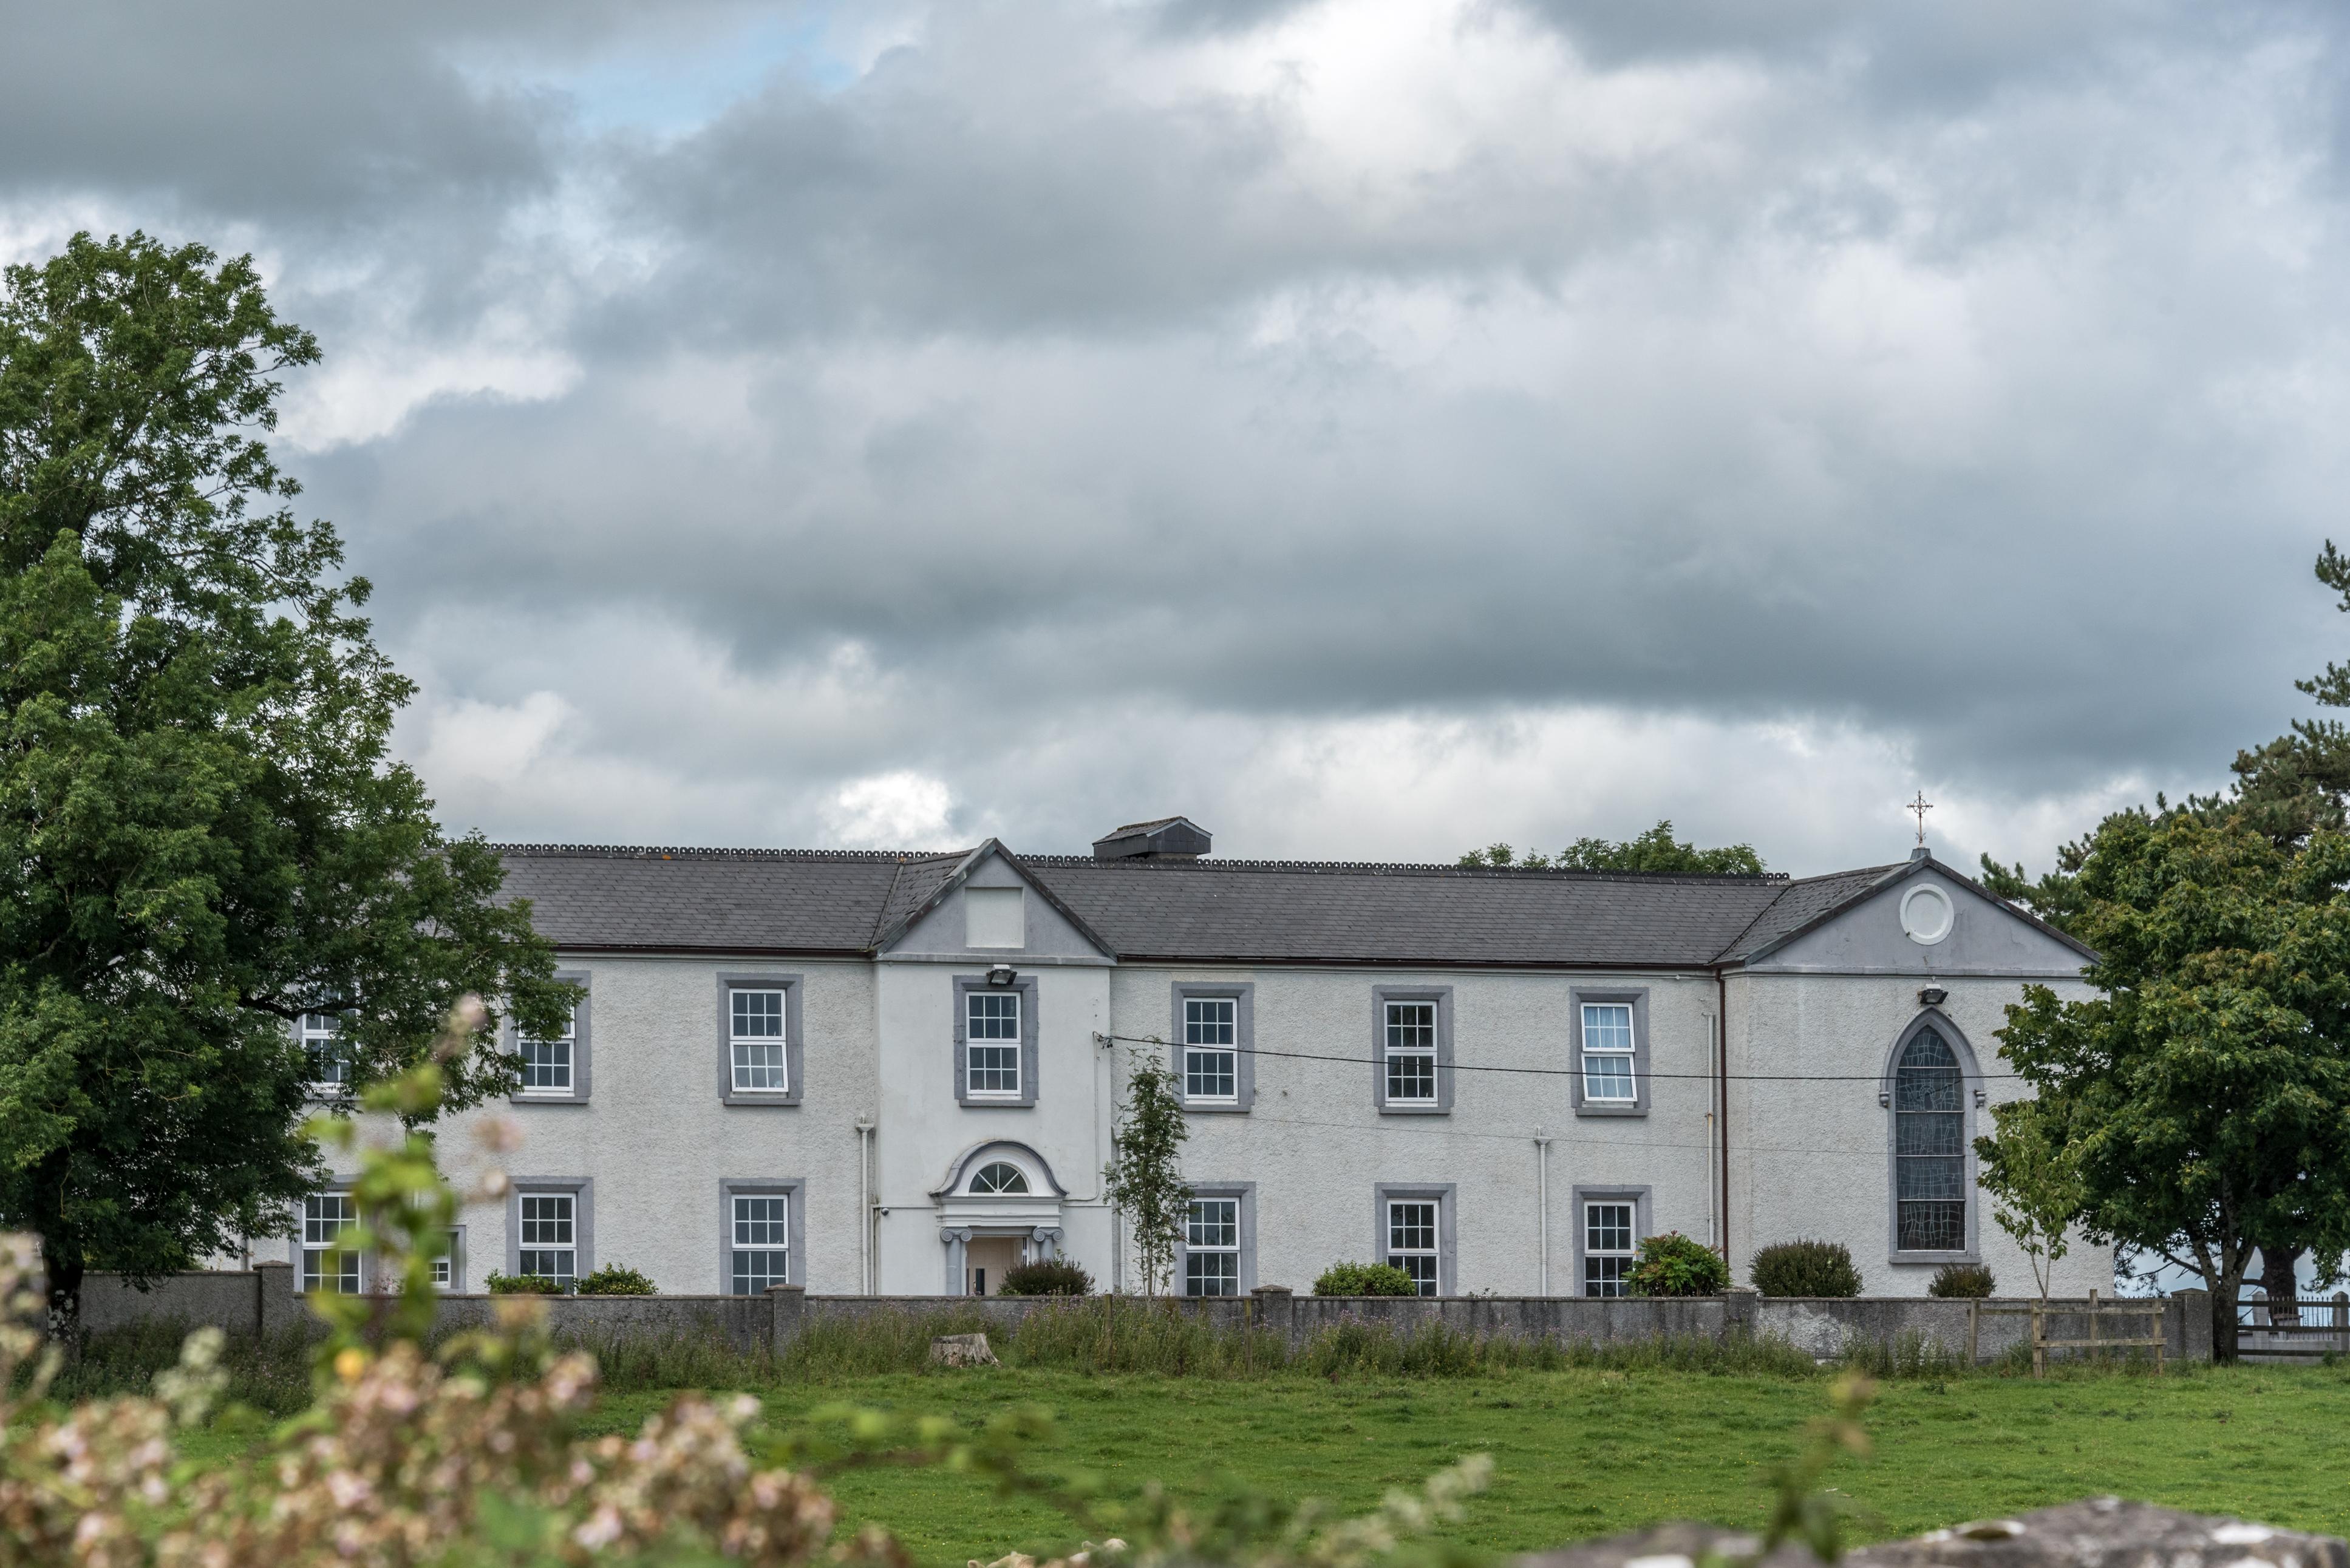 11  CARMELITE MONASTERY OF ST JOSEPH, MOUNT CARMEL - Galway County